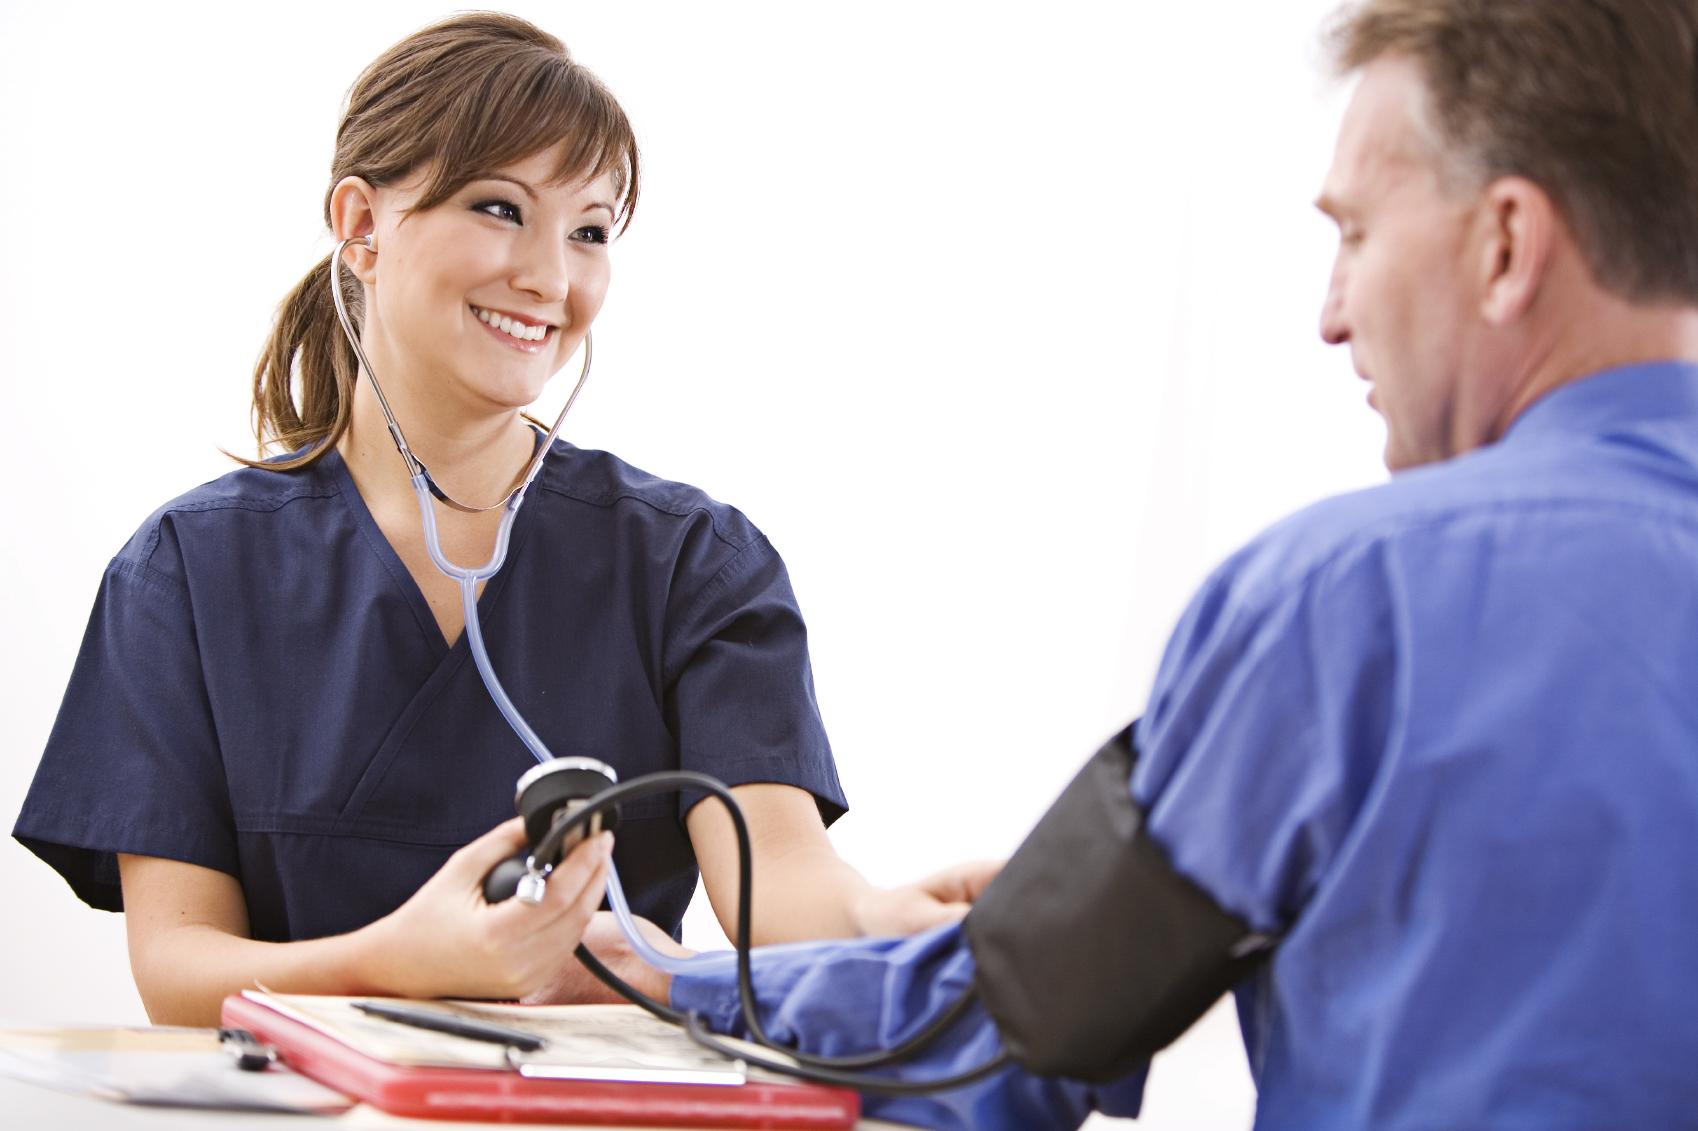 nursing_coordinator_image2